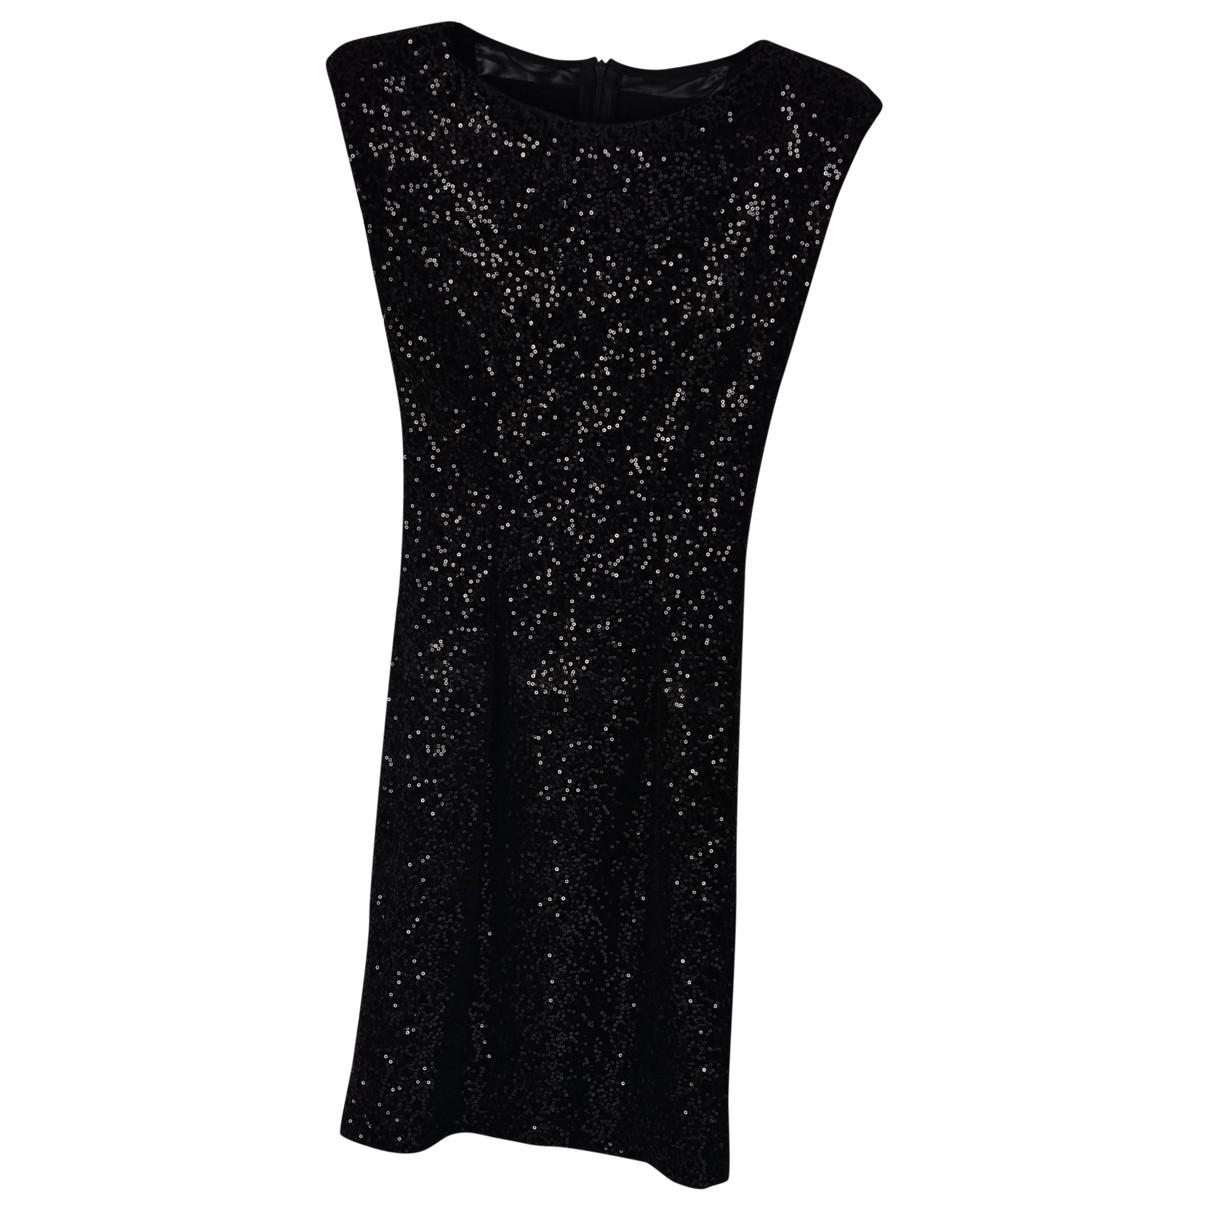 Alice & Olivia \N Kleid in  Schwarz Polyester